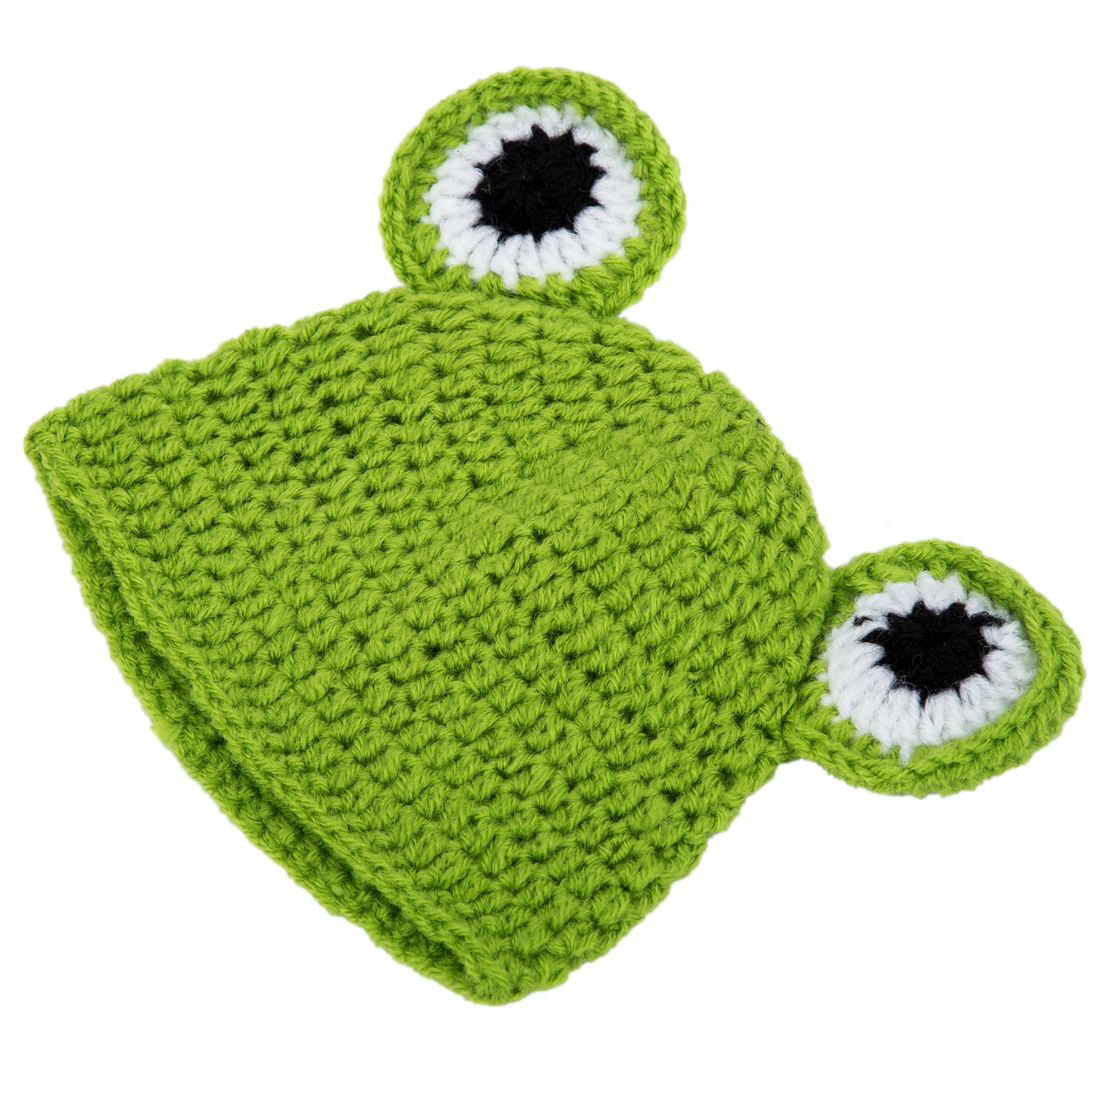 ABWE Best Sale Kids Handmade newborn Baby infant boy prince Girl Costume Animal Beanie photography Props Set Crochet Cloth kni